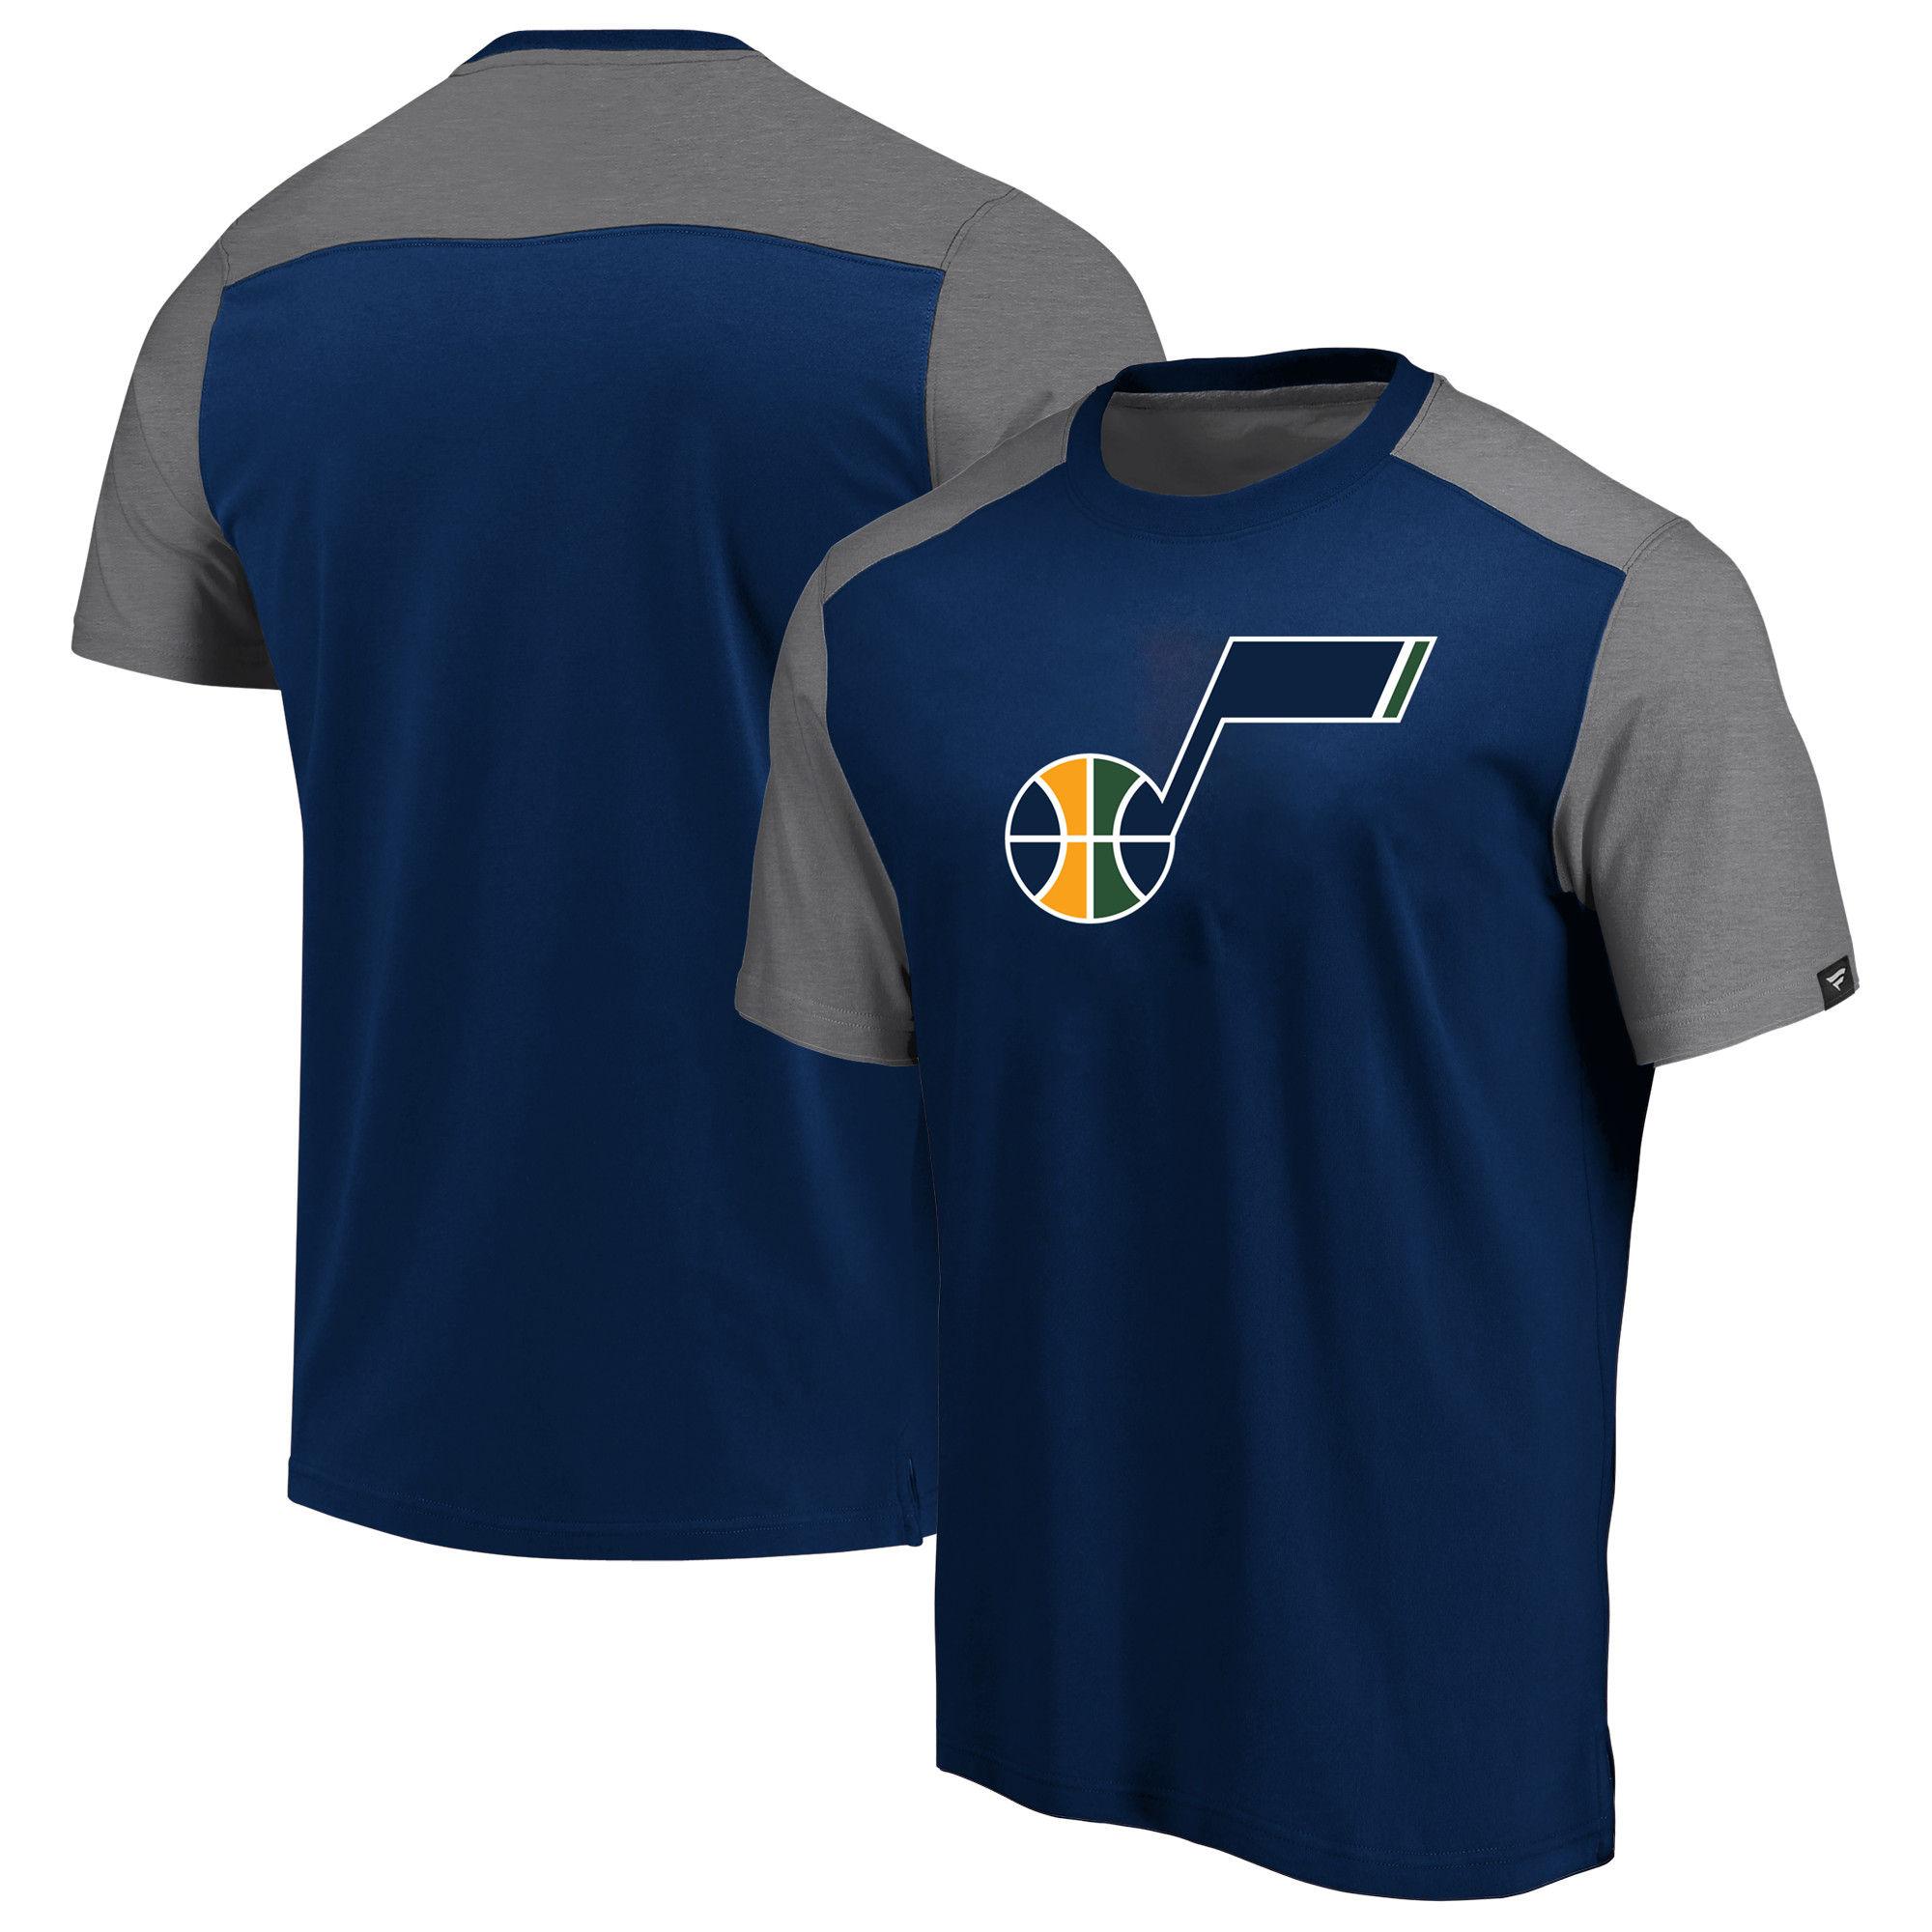 Utah Jazz Fanatics Branded Iconic Blocked T-Shirt Navy